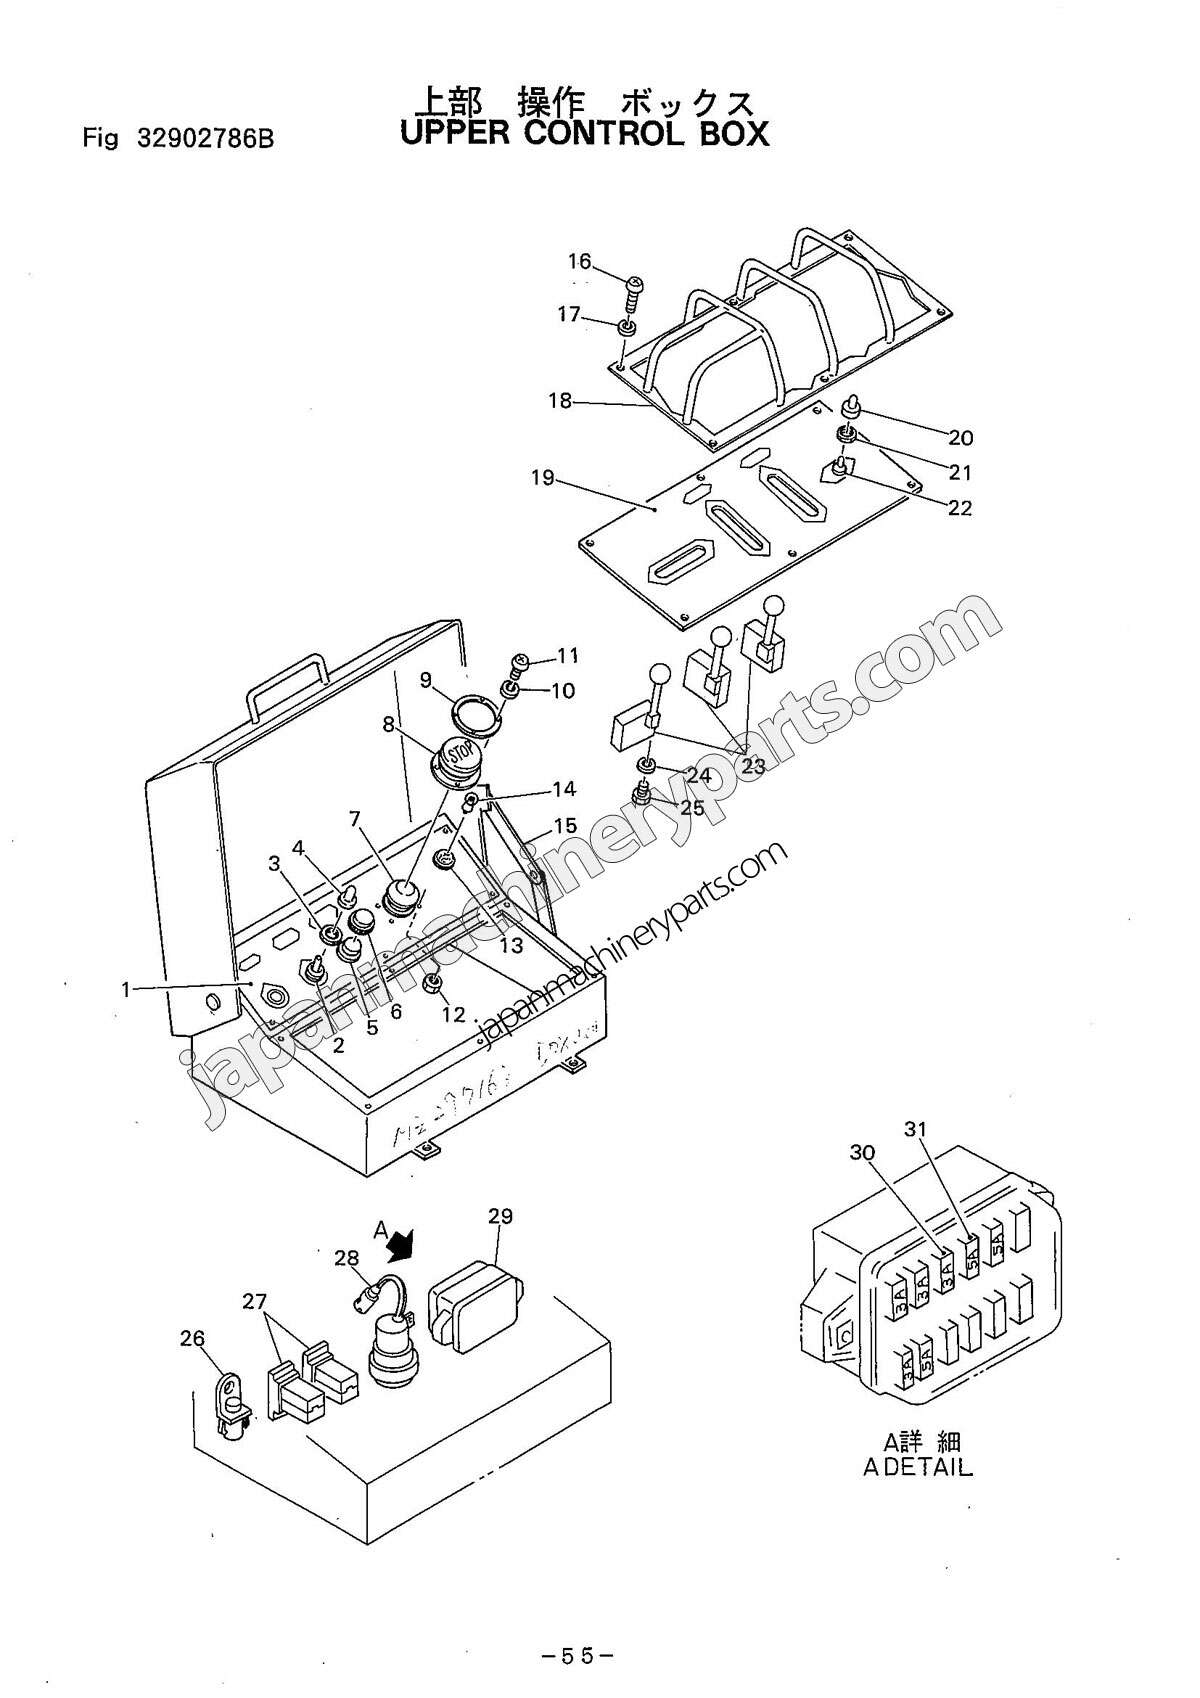 700r4 Valve Wiring Diagram. A/c Wiring Diagram, 4x4 Wiring Diagram on